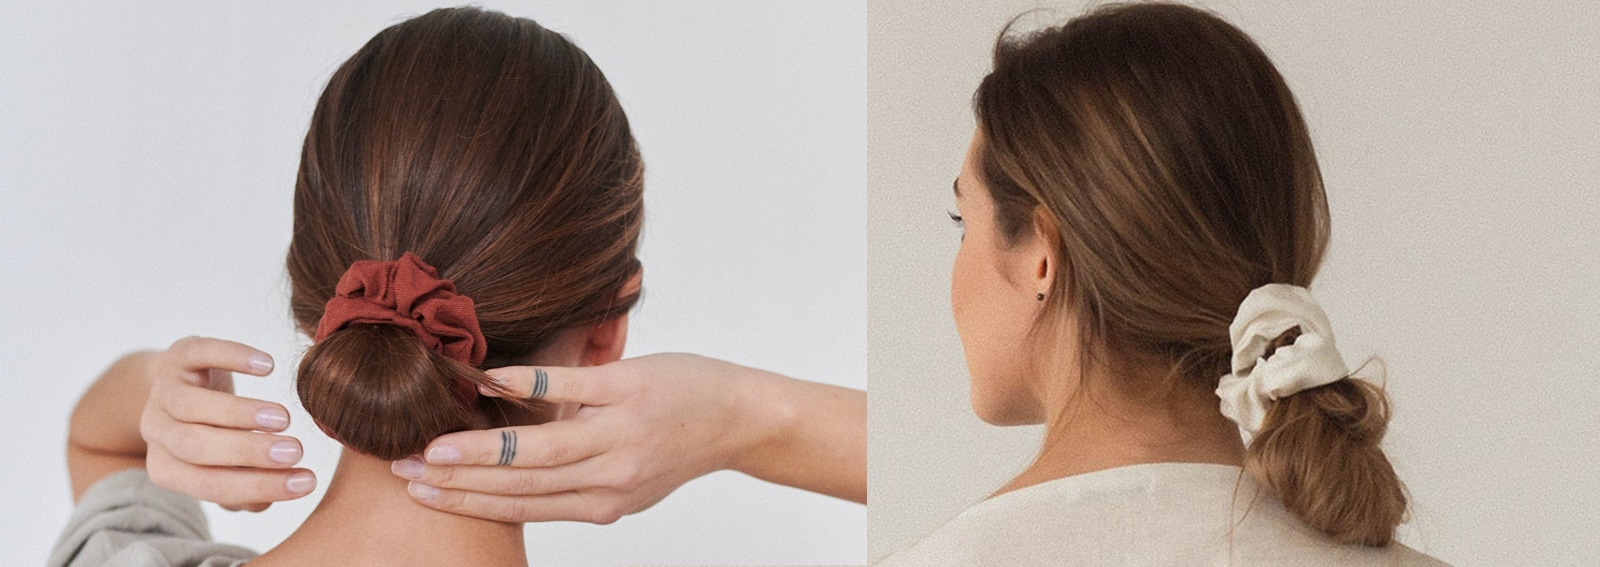 scrunchie-elastico-per-i-capelli-in-tessuto-cover-desktop